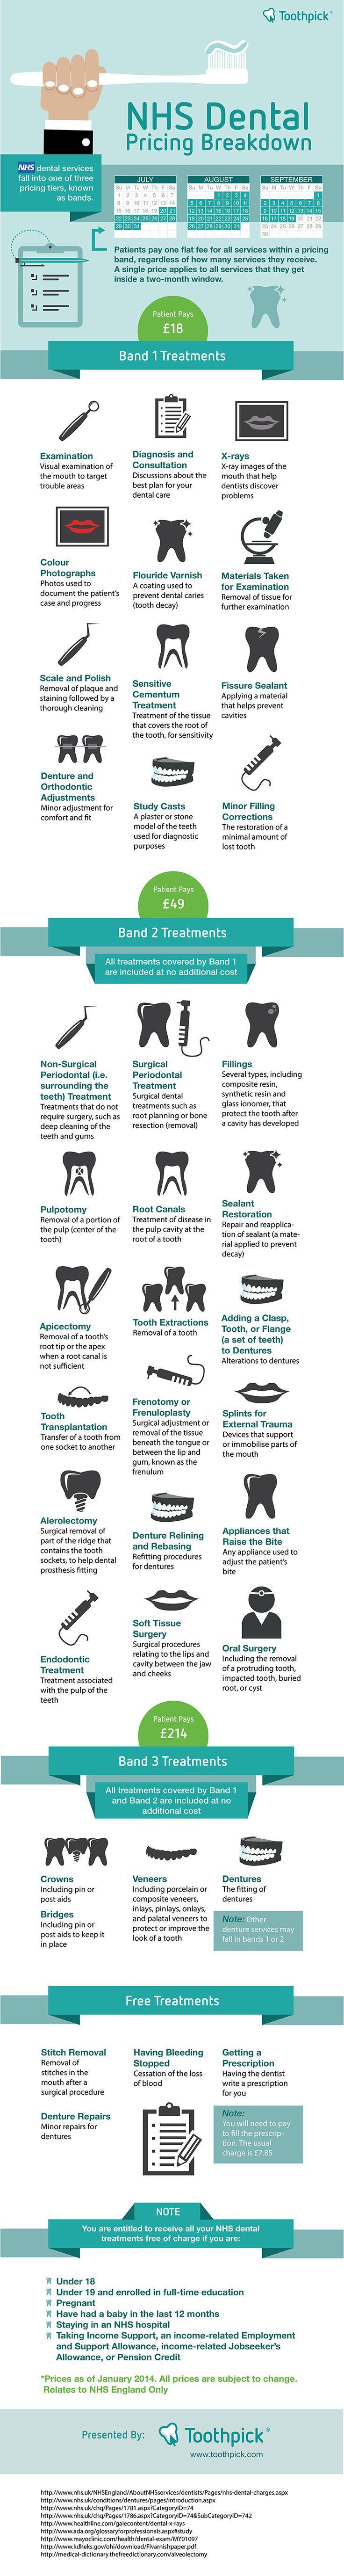 Medical infographic NHS Dental Pricing Bands Explained